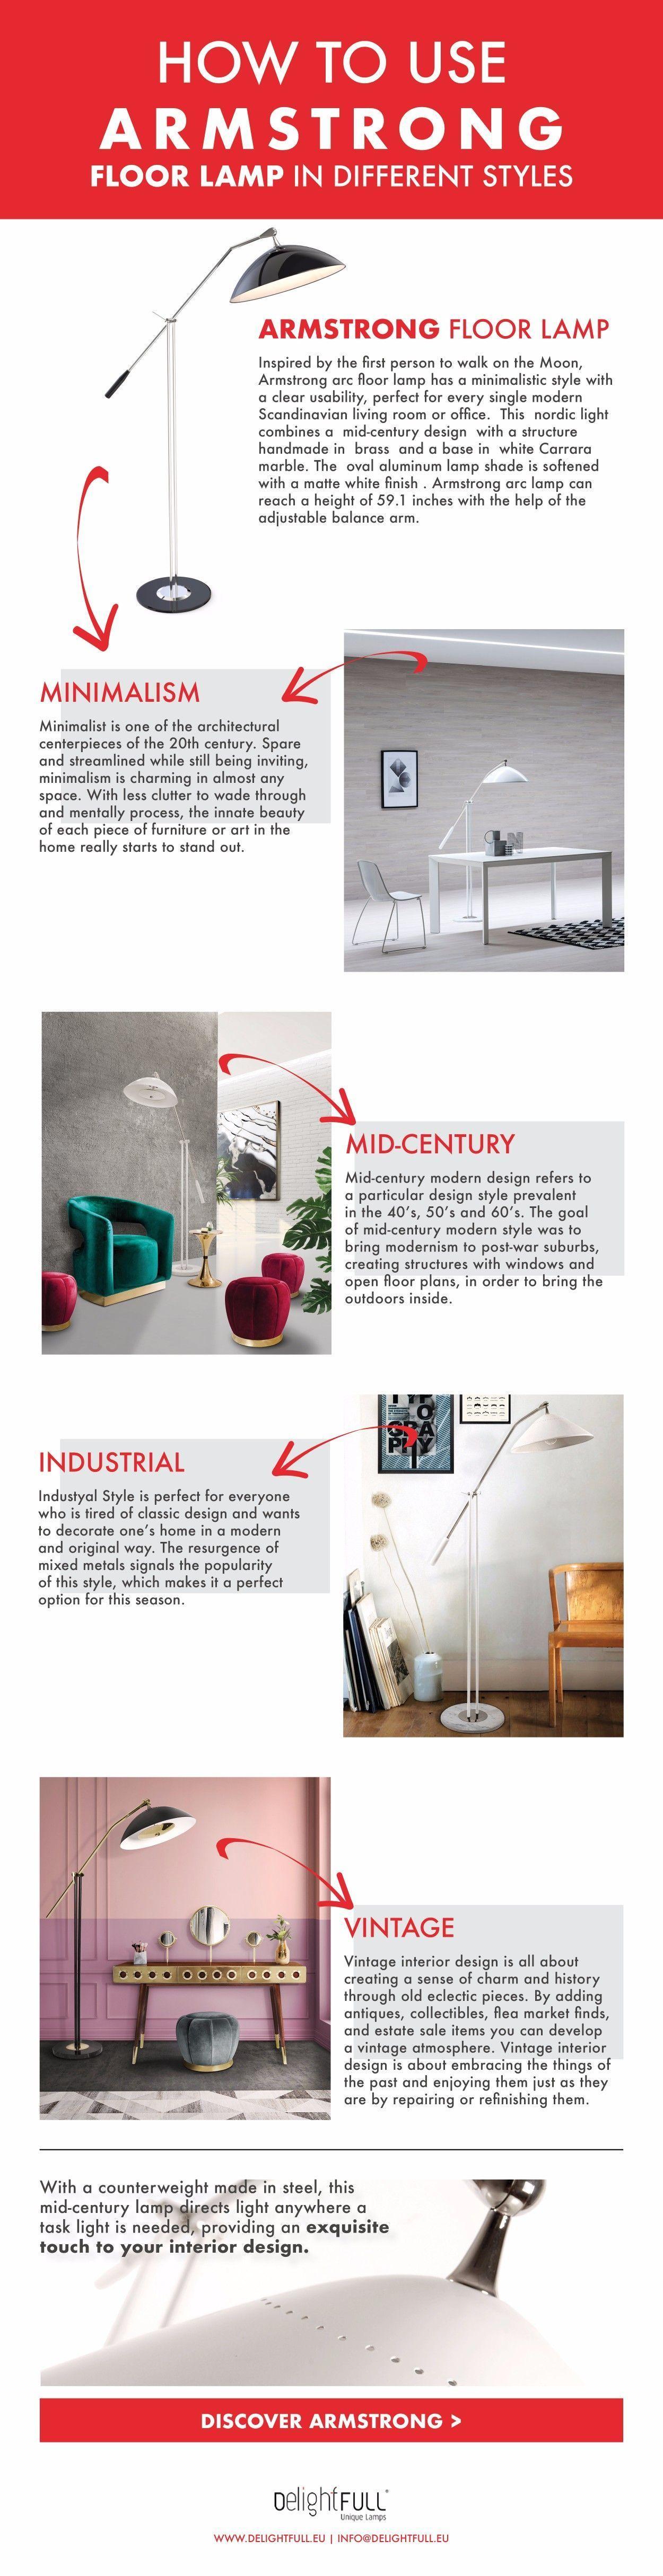 Dazzling Design Projects From Lighting Genius DelightFULL |  Http://www.delightfull.eu/usa/. Mid Century Modern Lighting: Chandeliers, Pendant  Lights, ...